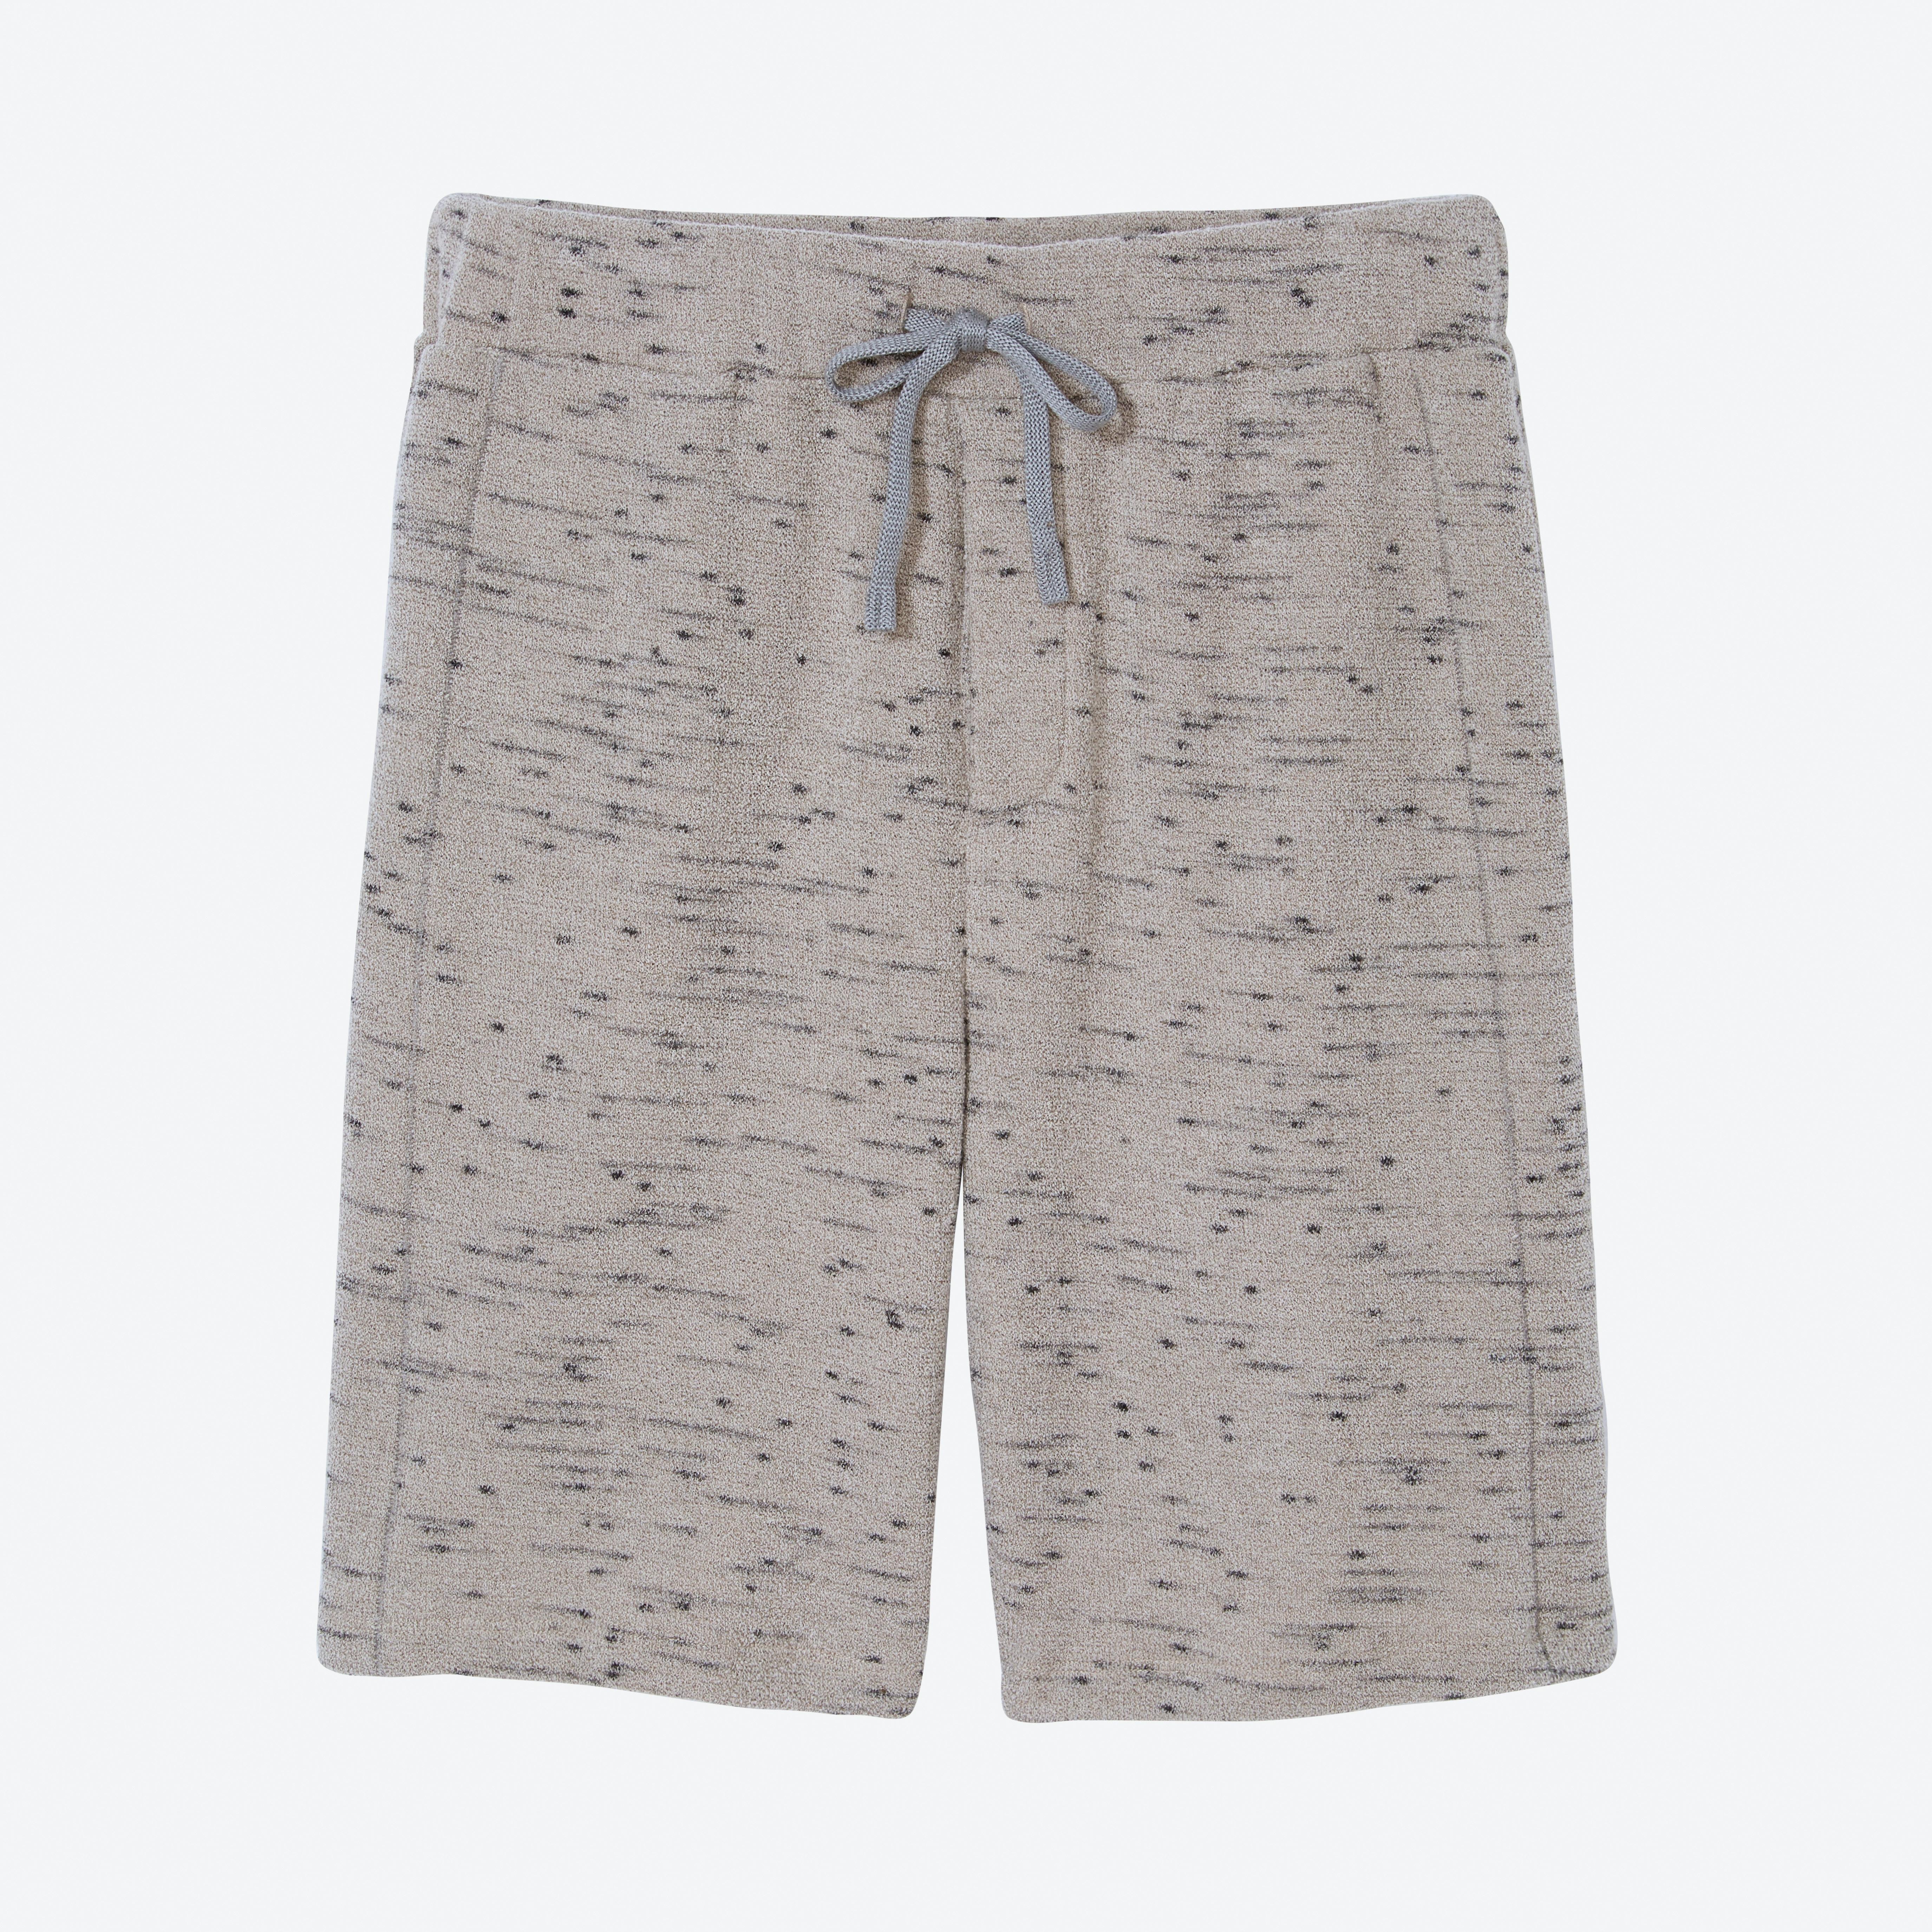 Thaddeus x Bonobos Terry Beach Shorts